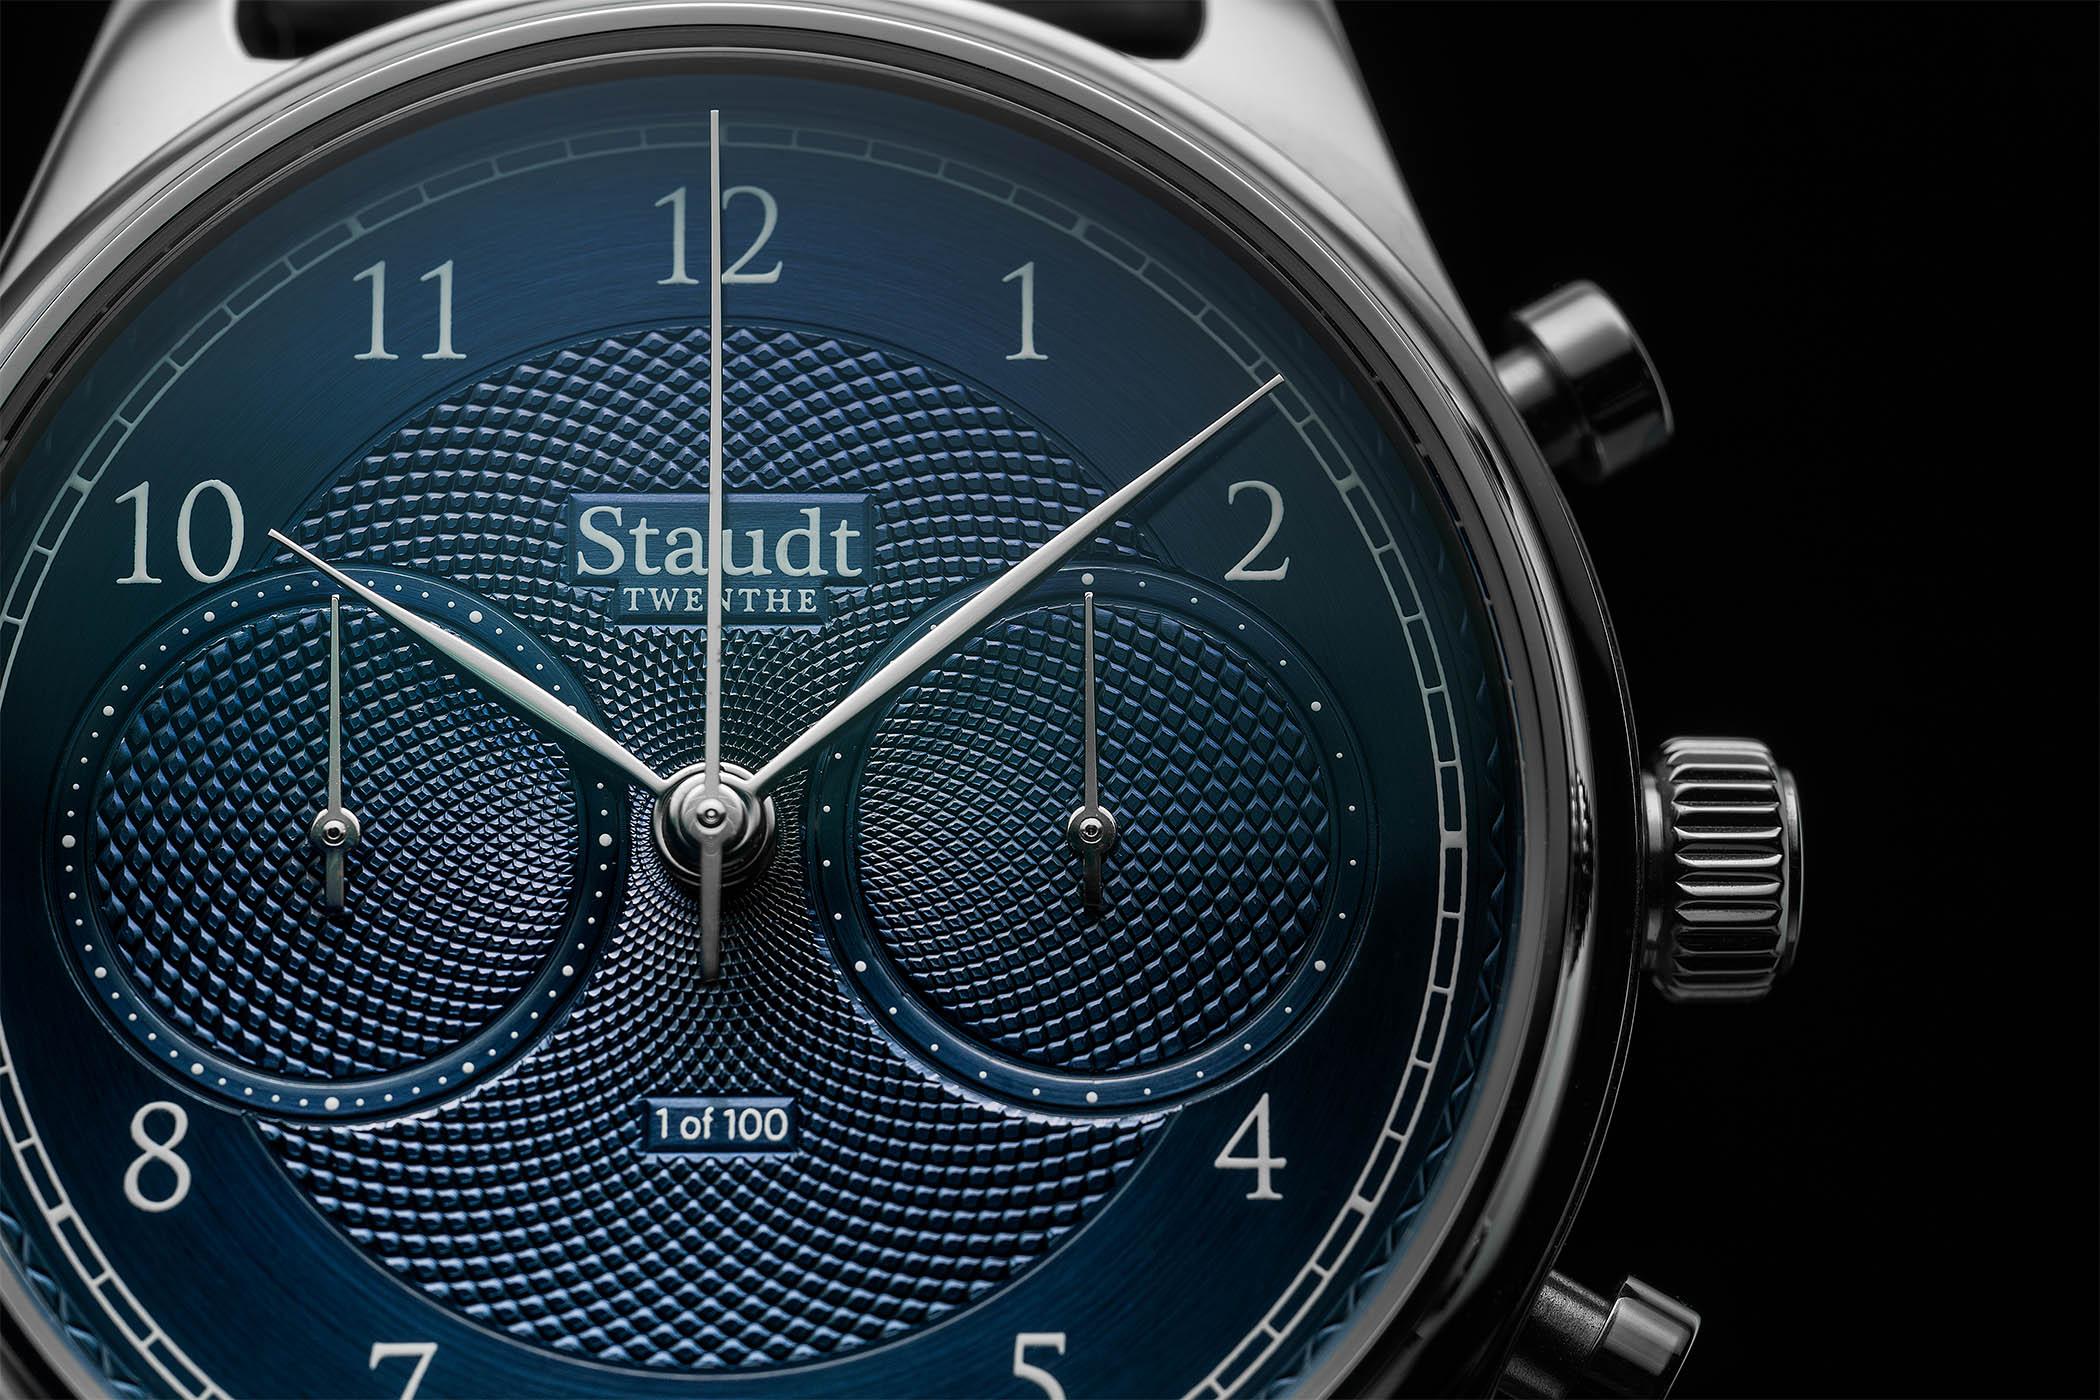 Staudt Guilloche Chronograph watch - 11